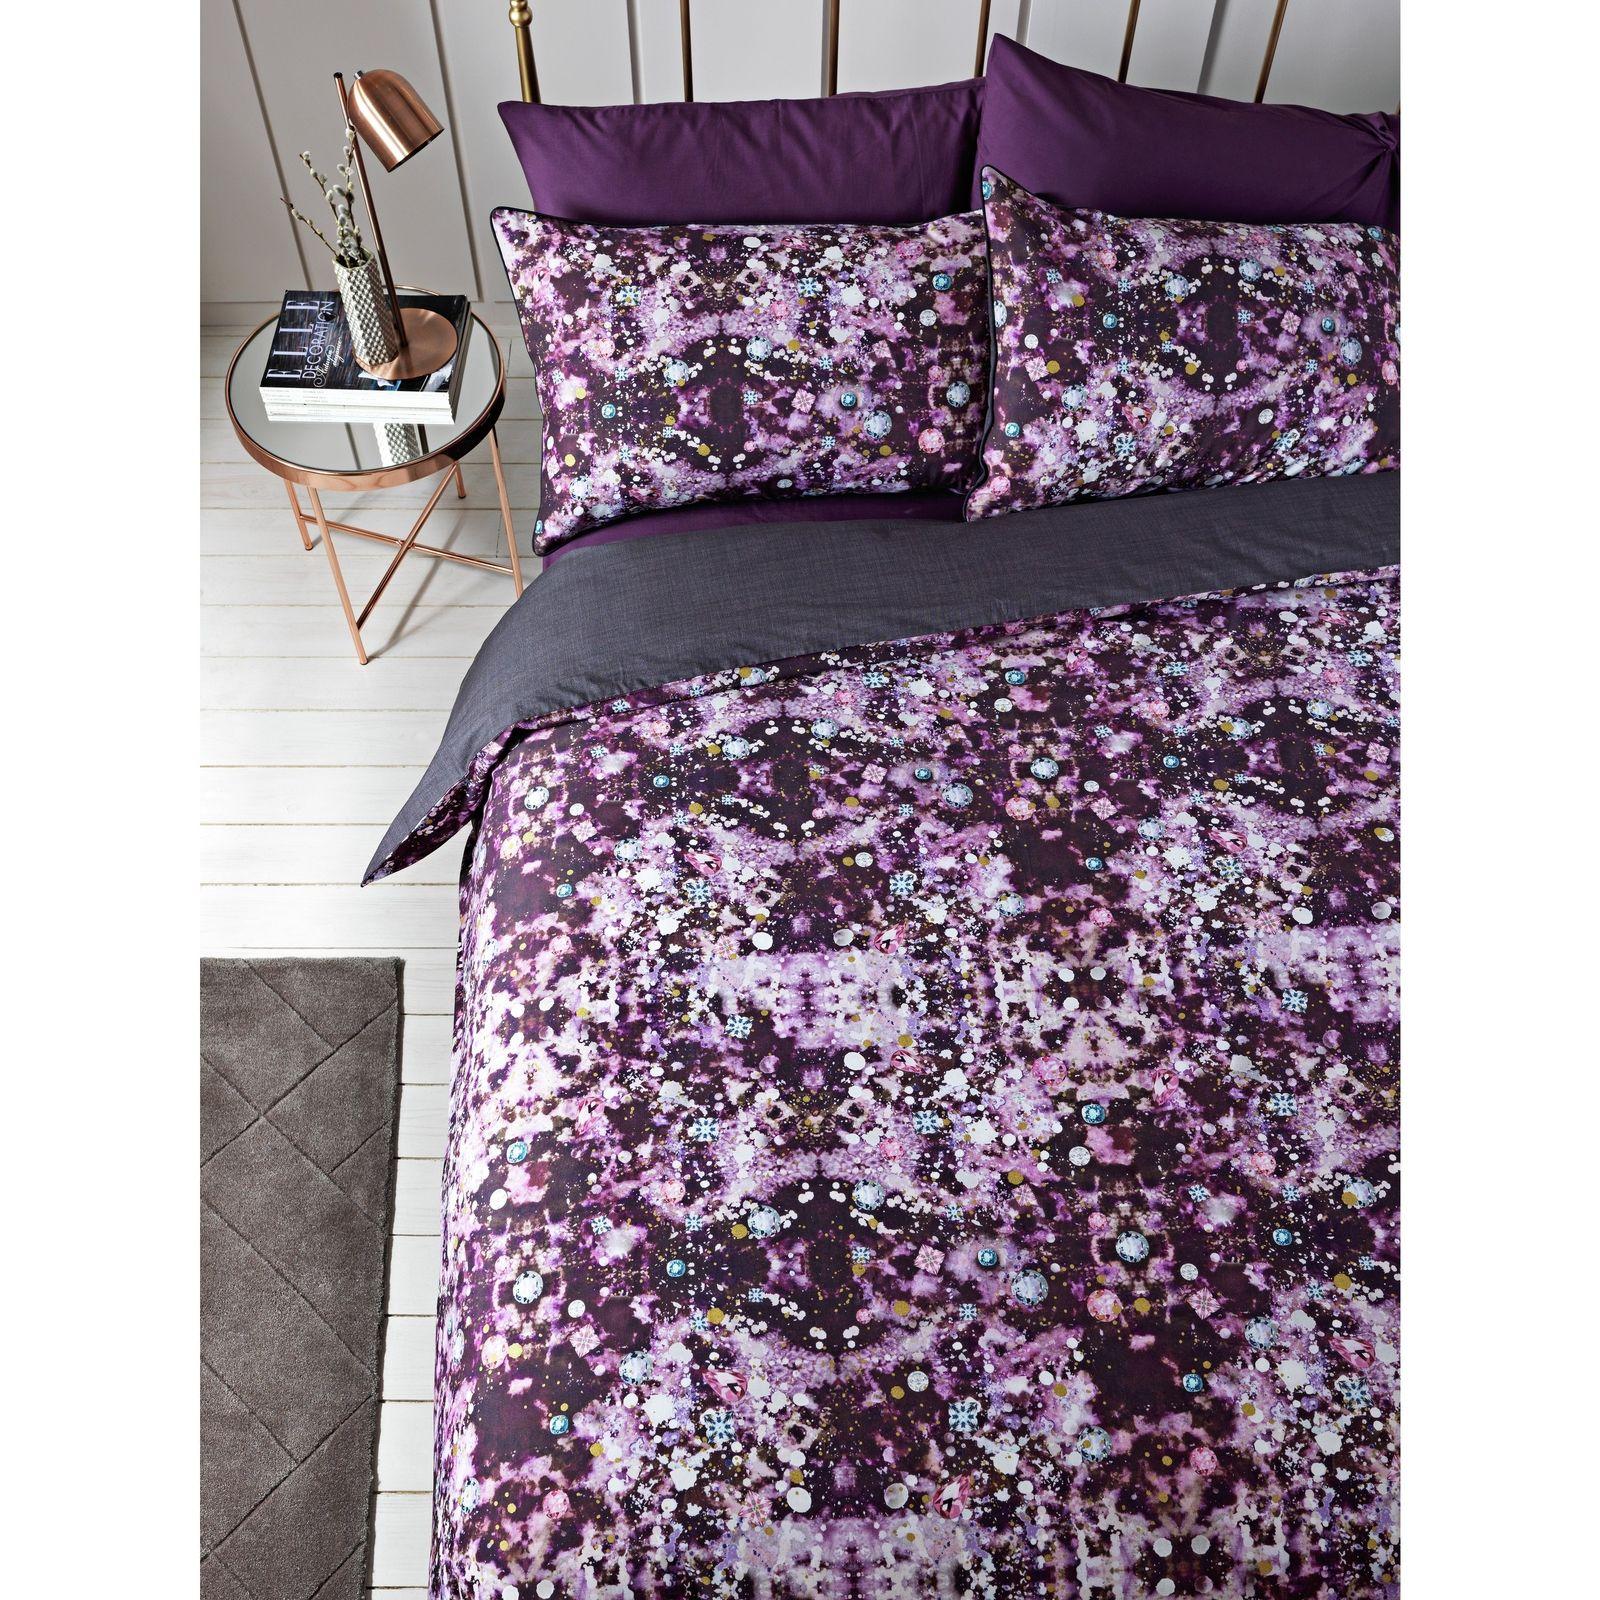 Bedding Set - Double  £7.99 King Size £13.99  Delivered @ Argos on Ebay